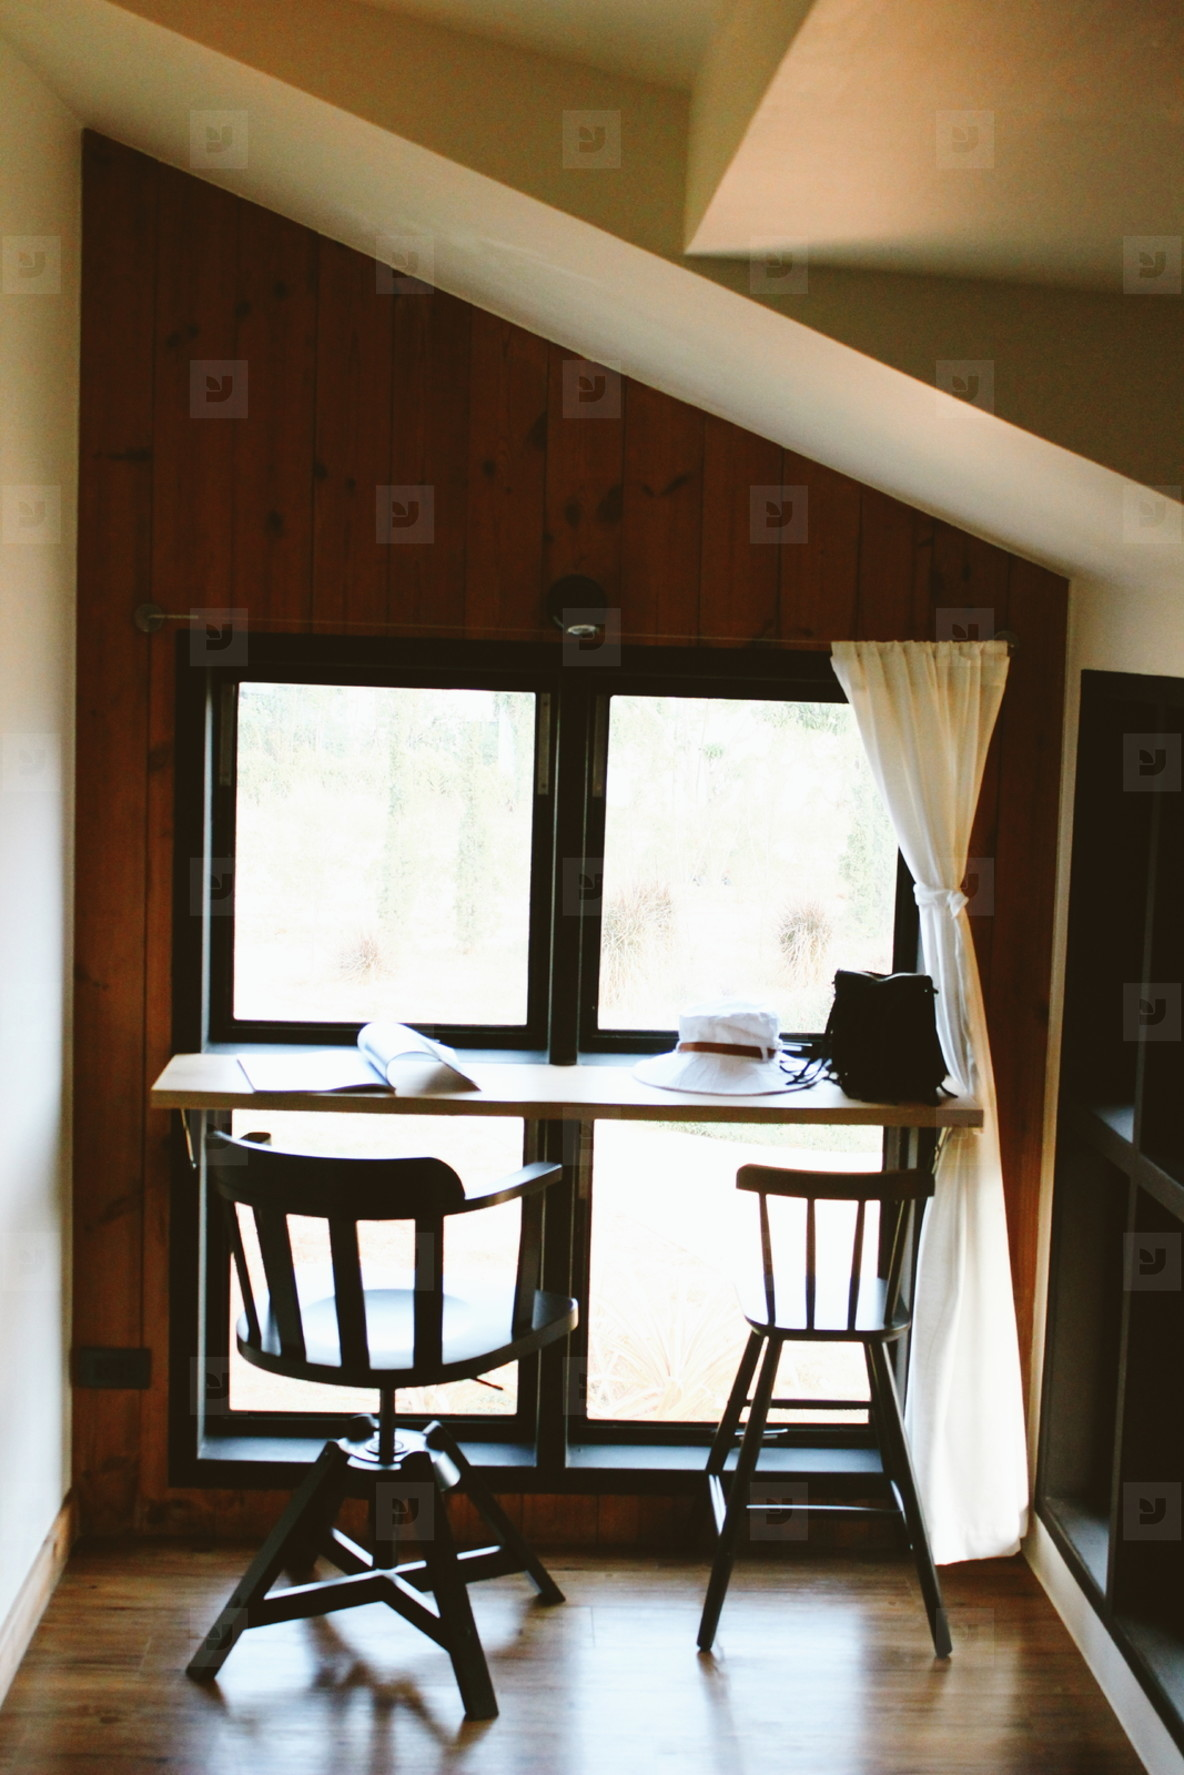 Hipster cafe interior  08